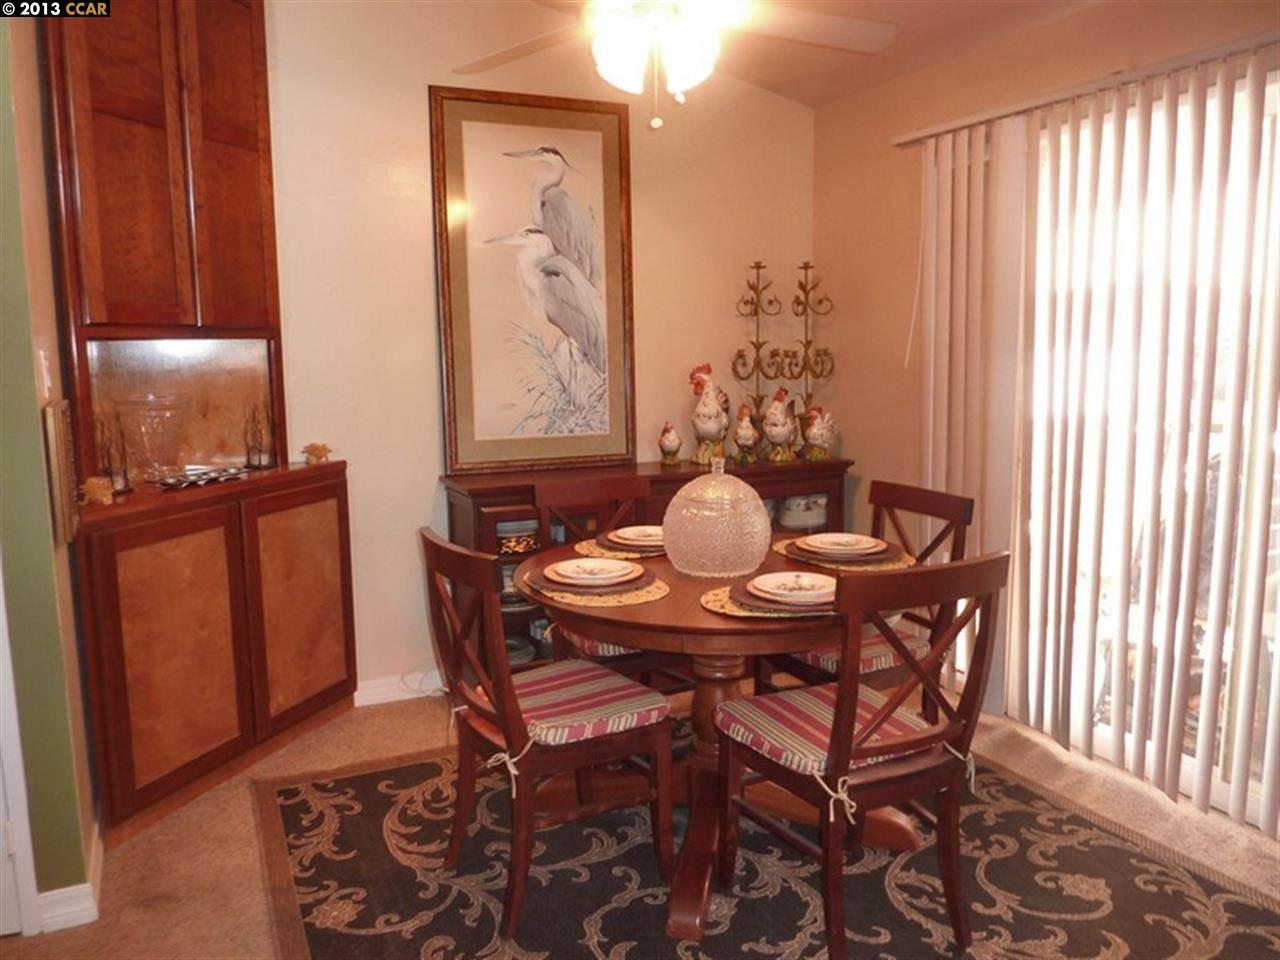 Additional photo for property listing at 1722 PINE Street  Livermore, California 94551 Estados Unidos